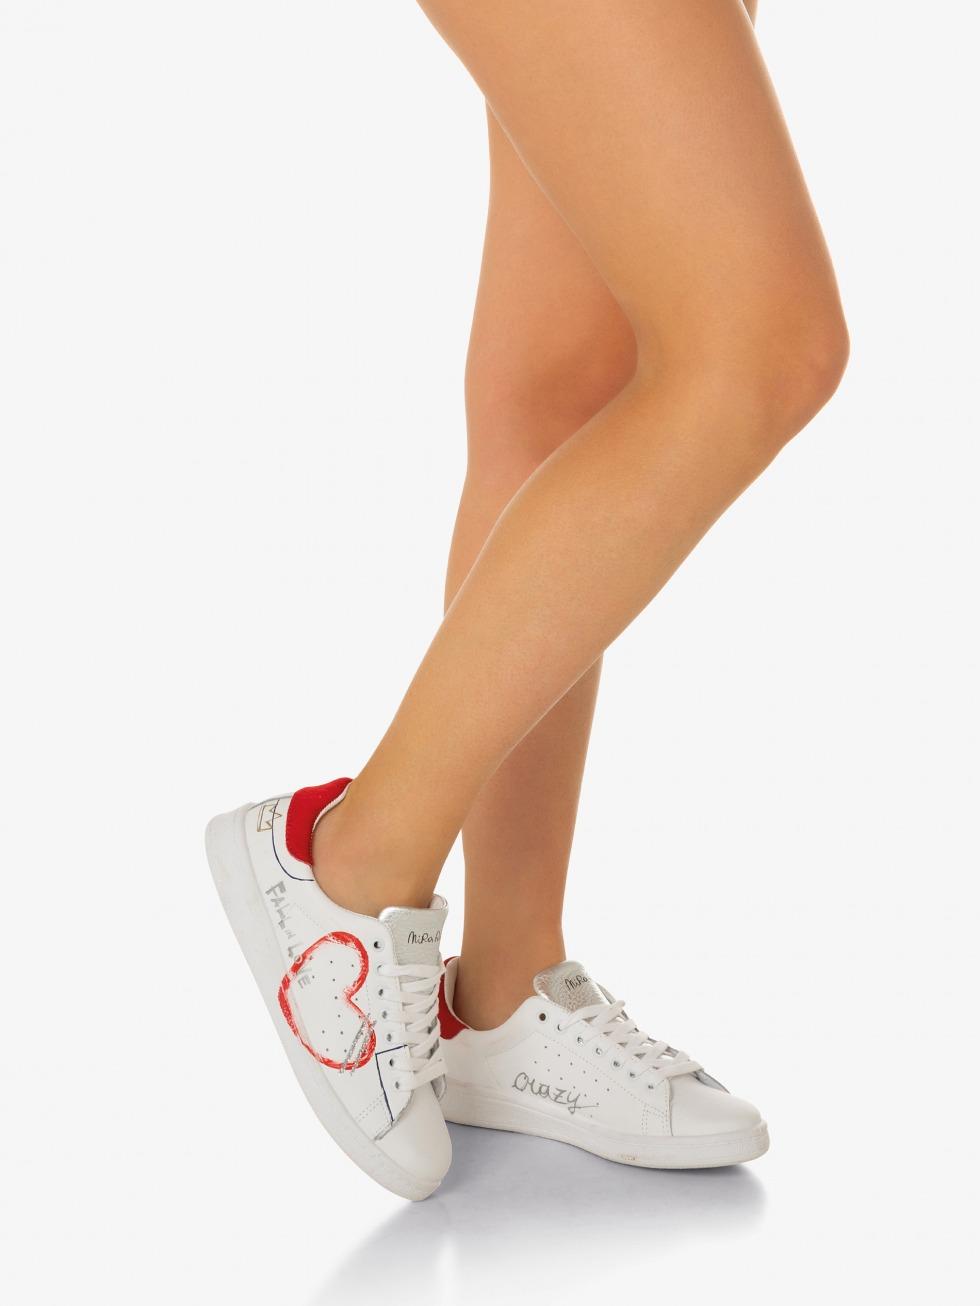 Daiquiri Sneakers - Red Heart Writer